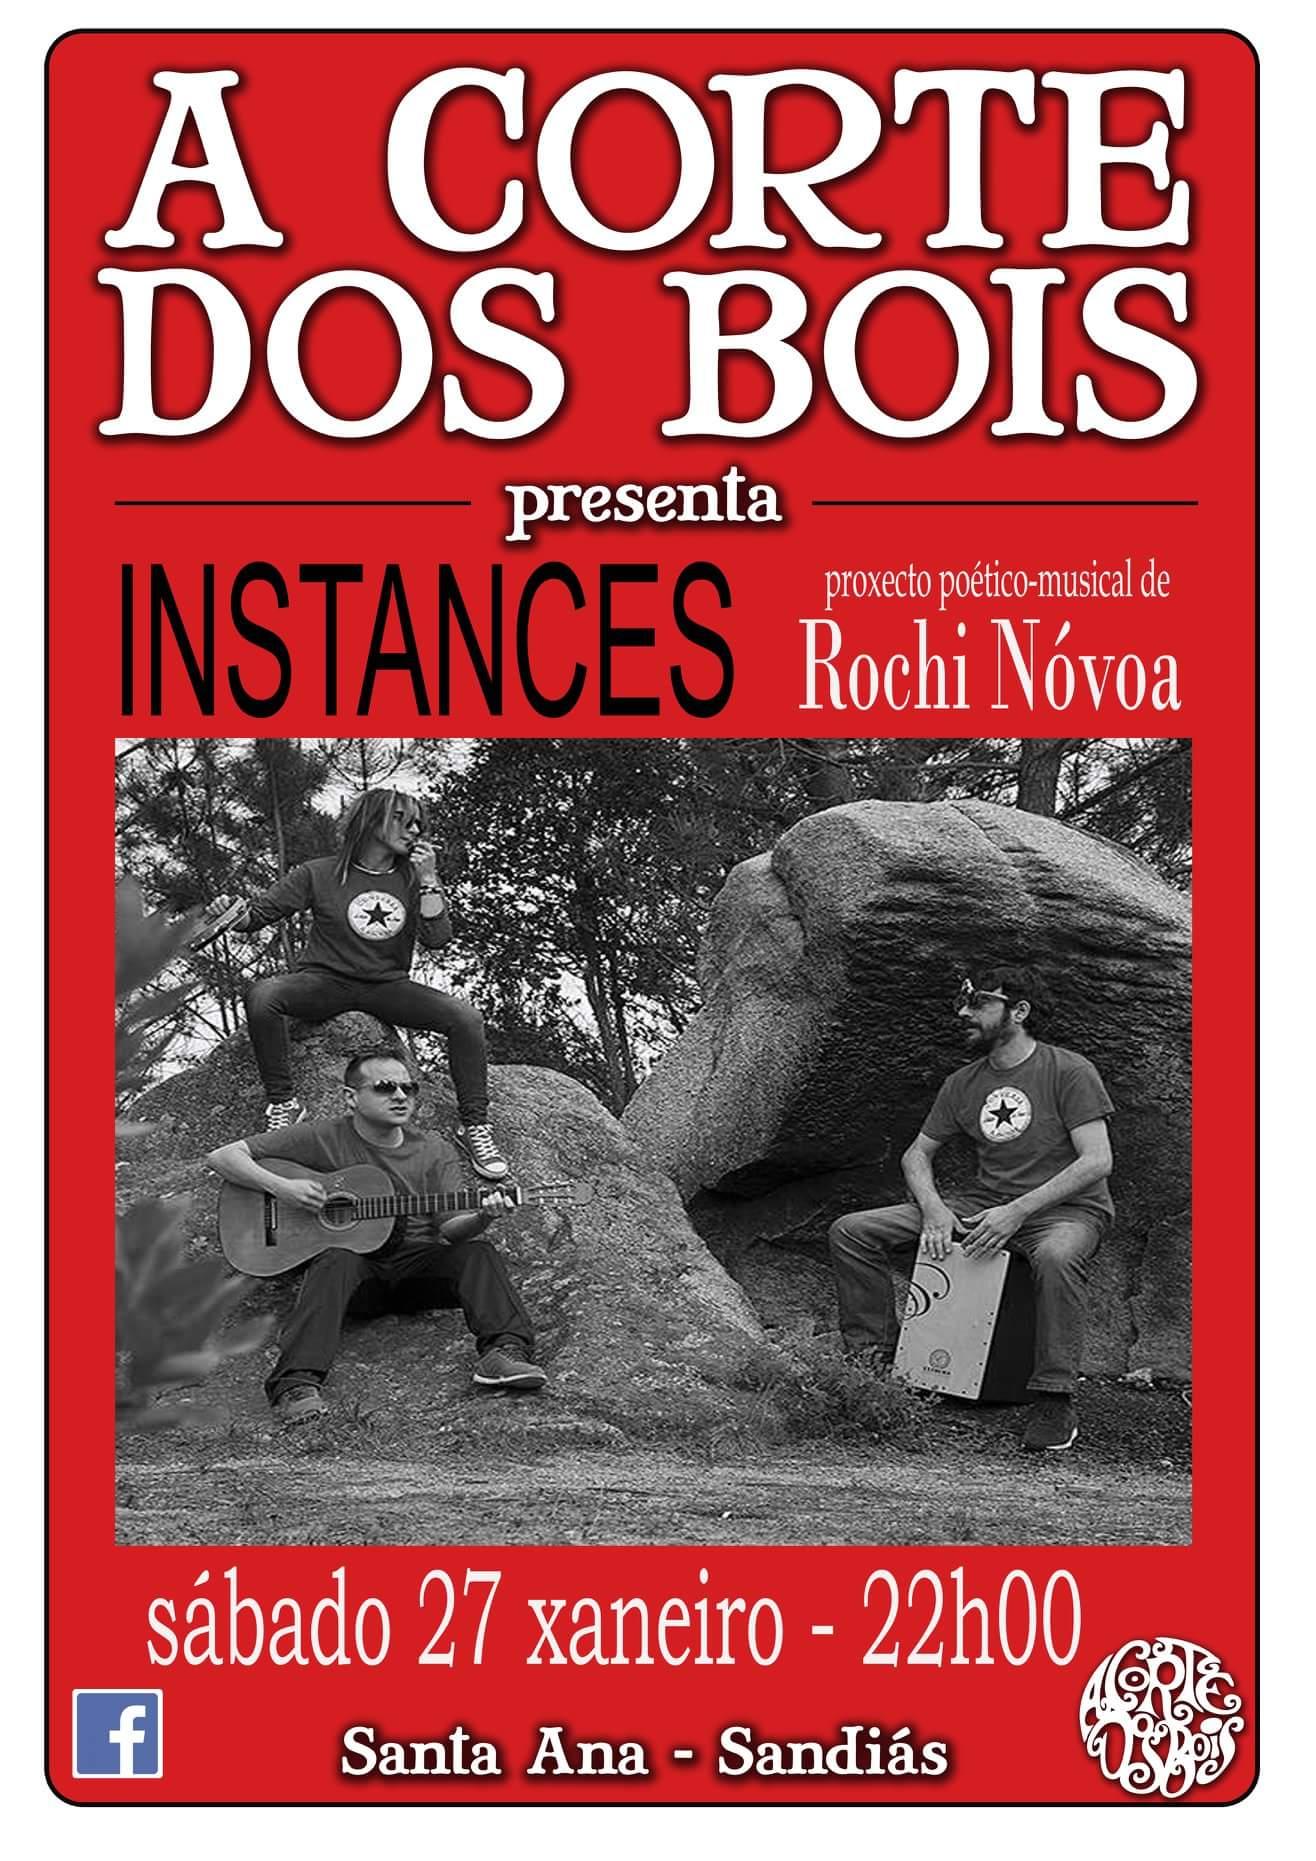 Instances 27/21/2018 A Corte dos Bois